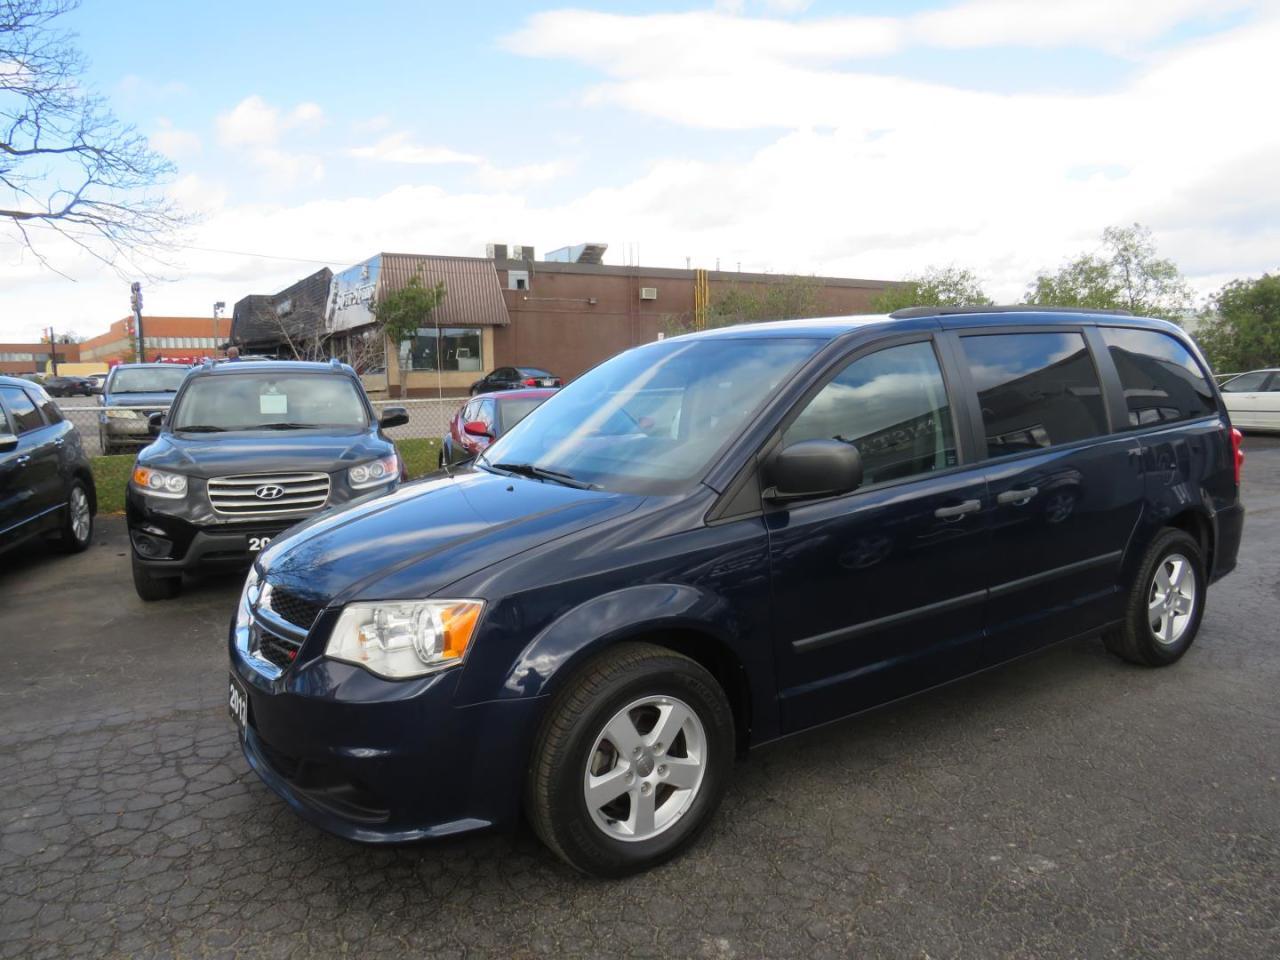 2013 Dodge Grand Caravan SE (SOLD)